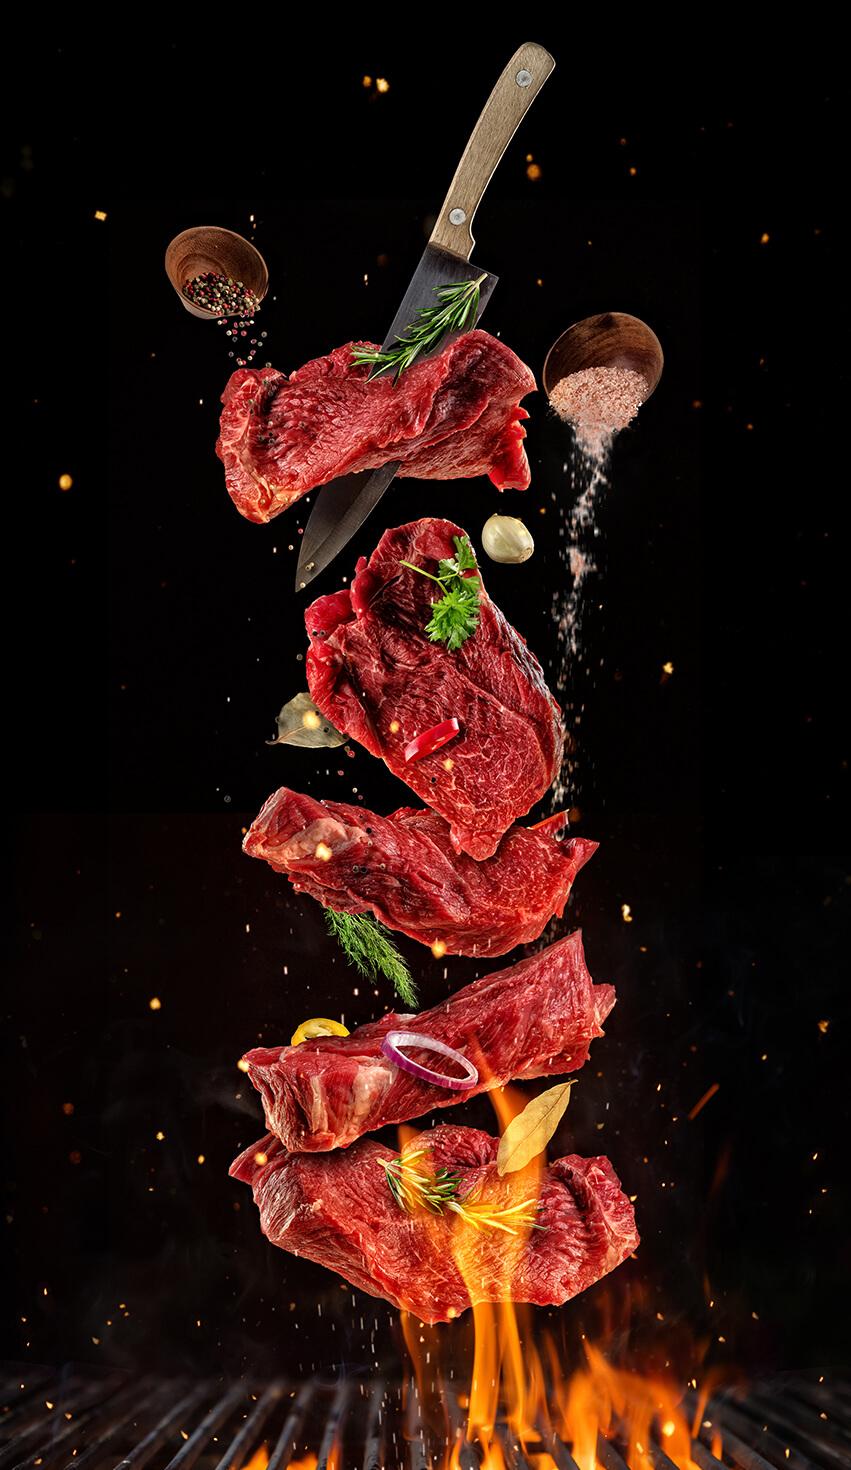 Reepjes steak op spies